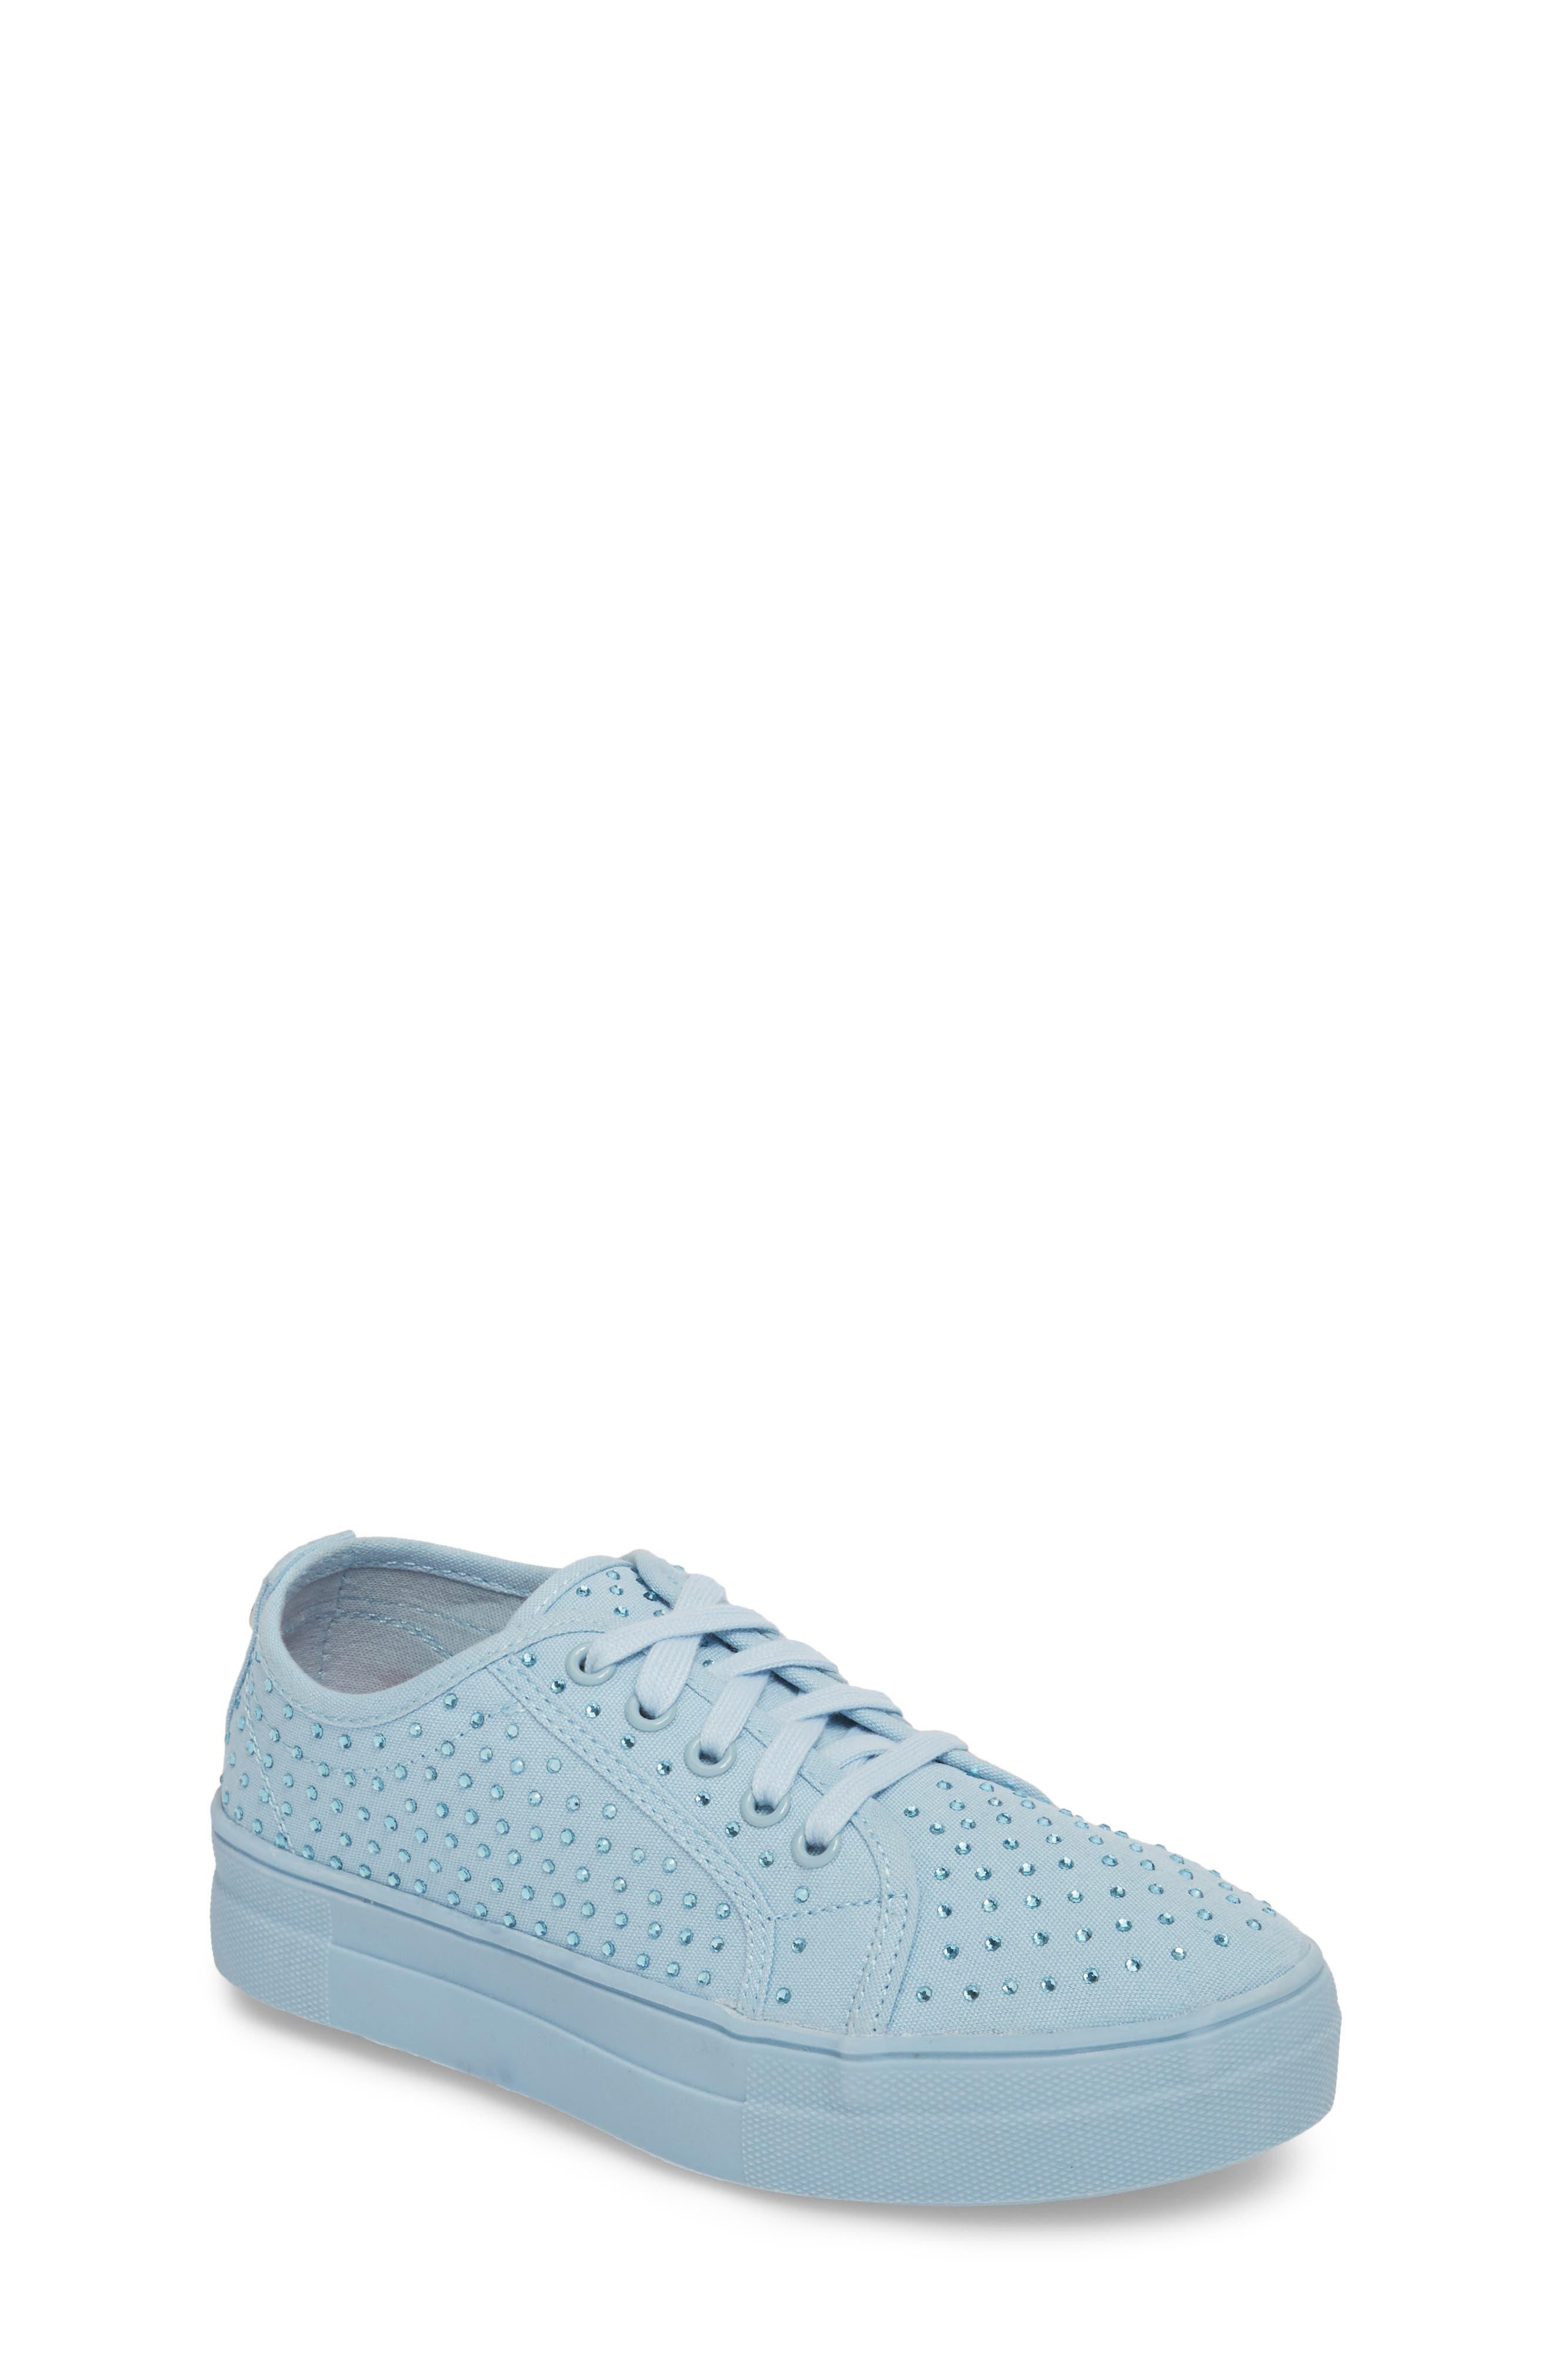 Jmono Sneaker,                             Main thumbnail 1, color,                             Blue